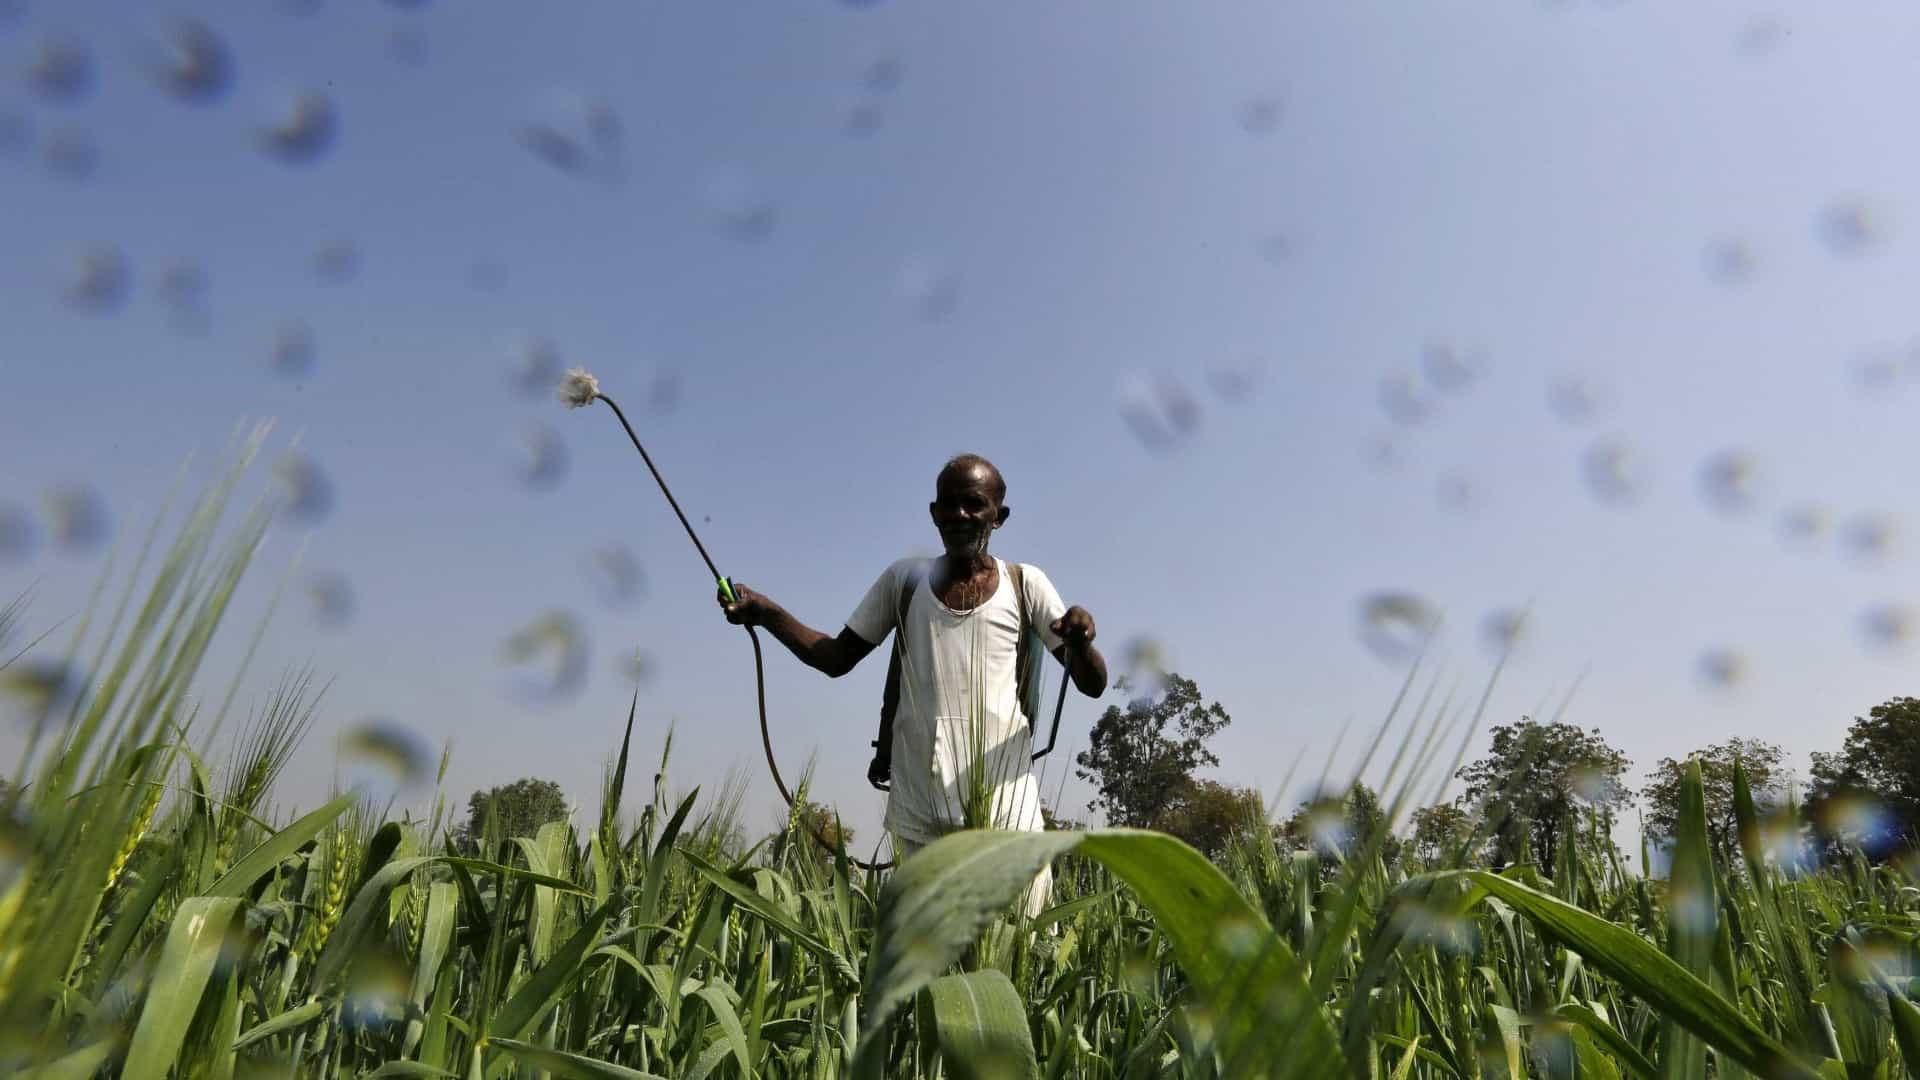 Governo vai aprovar mais agrotóxicos para 'entrar na modernidade'